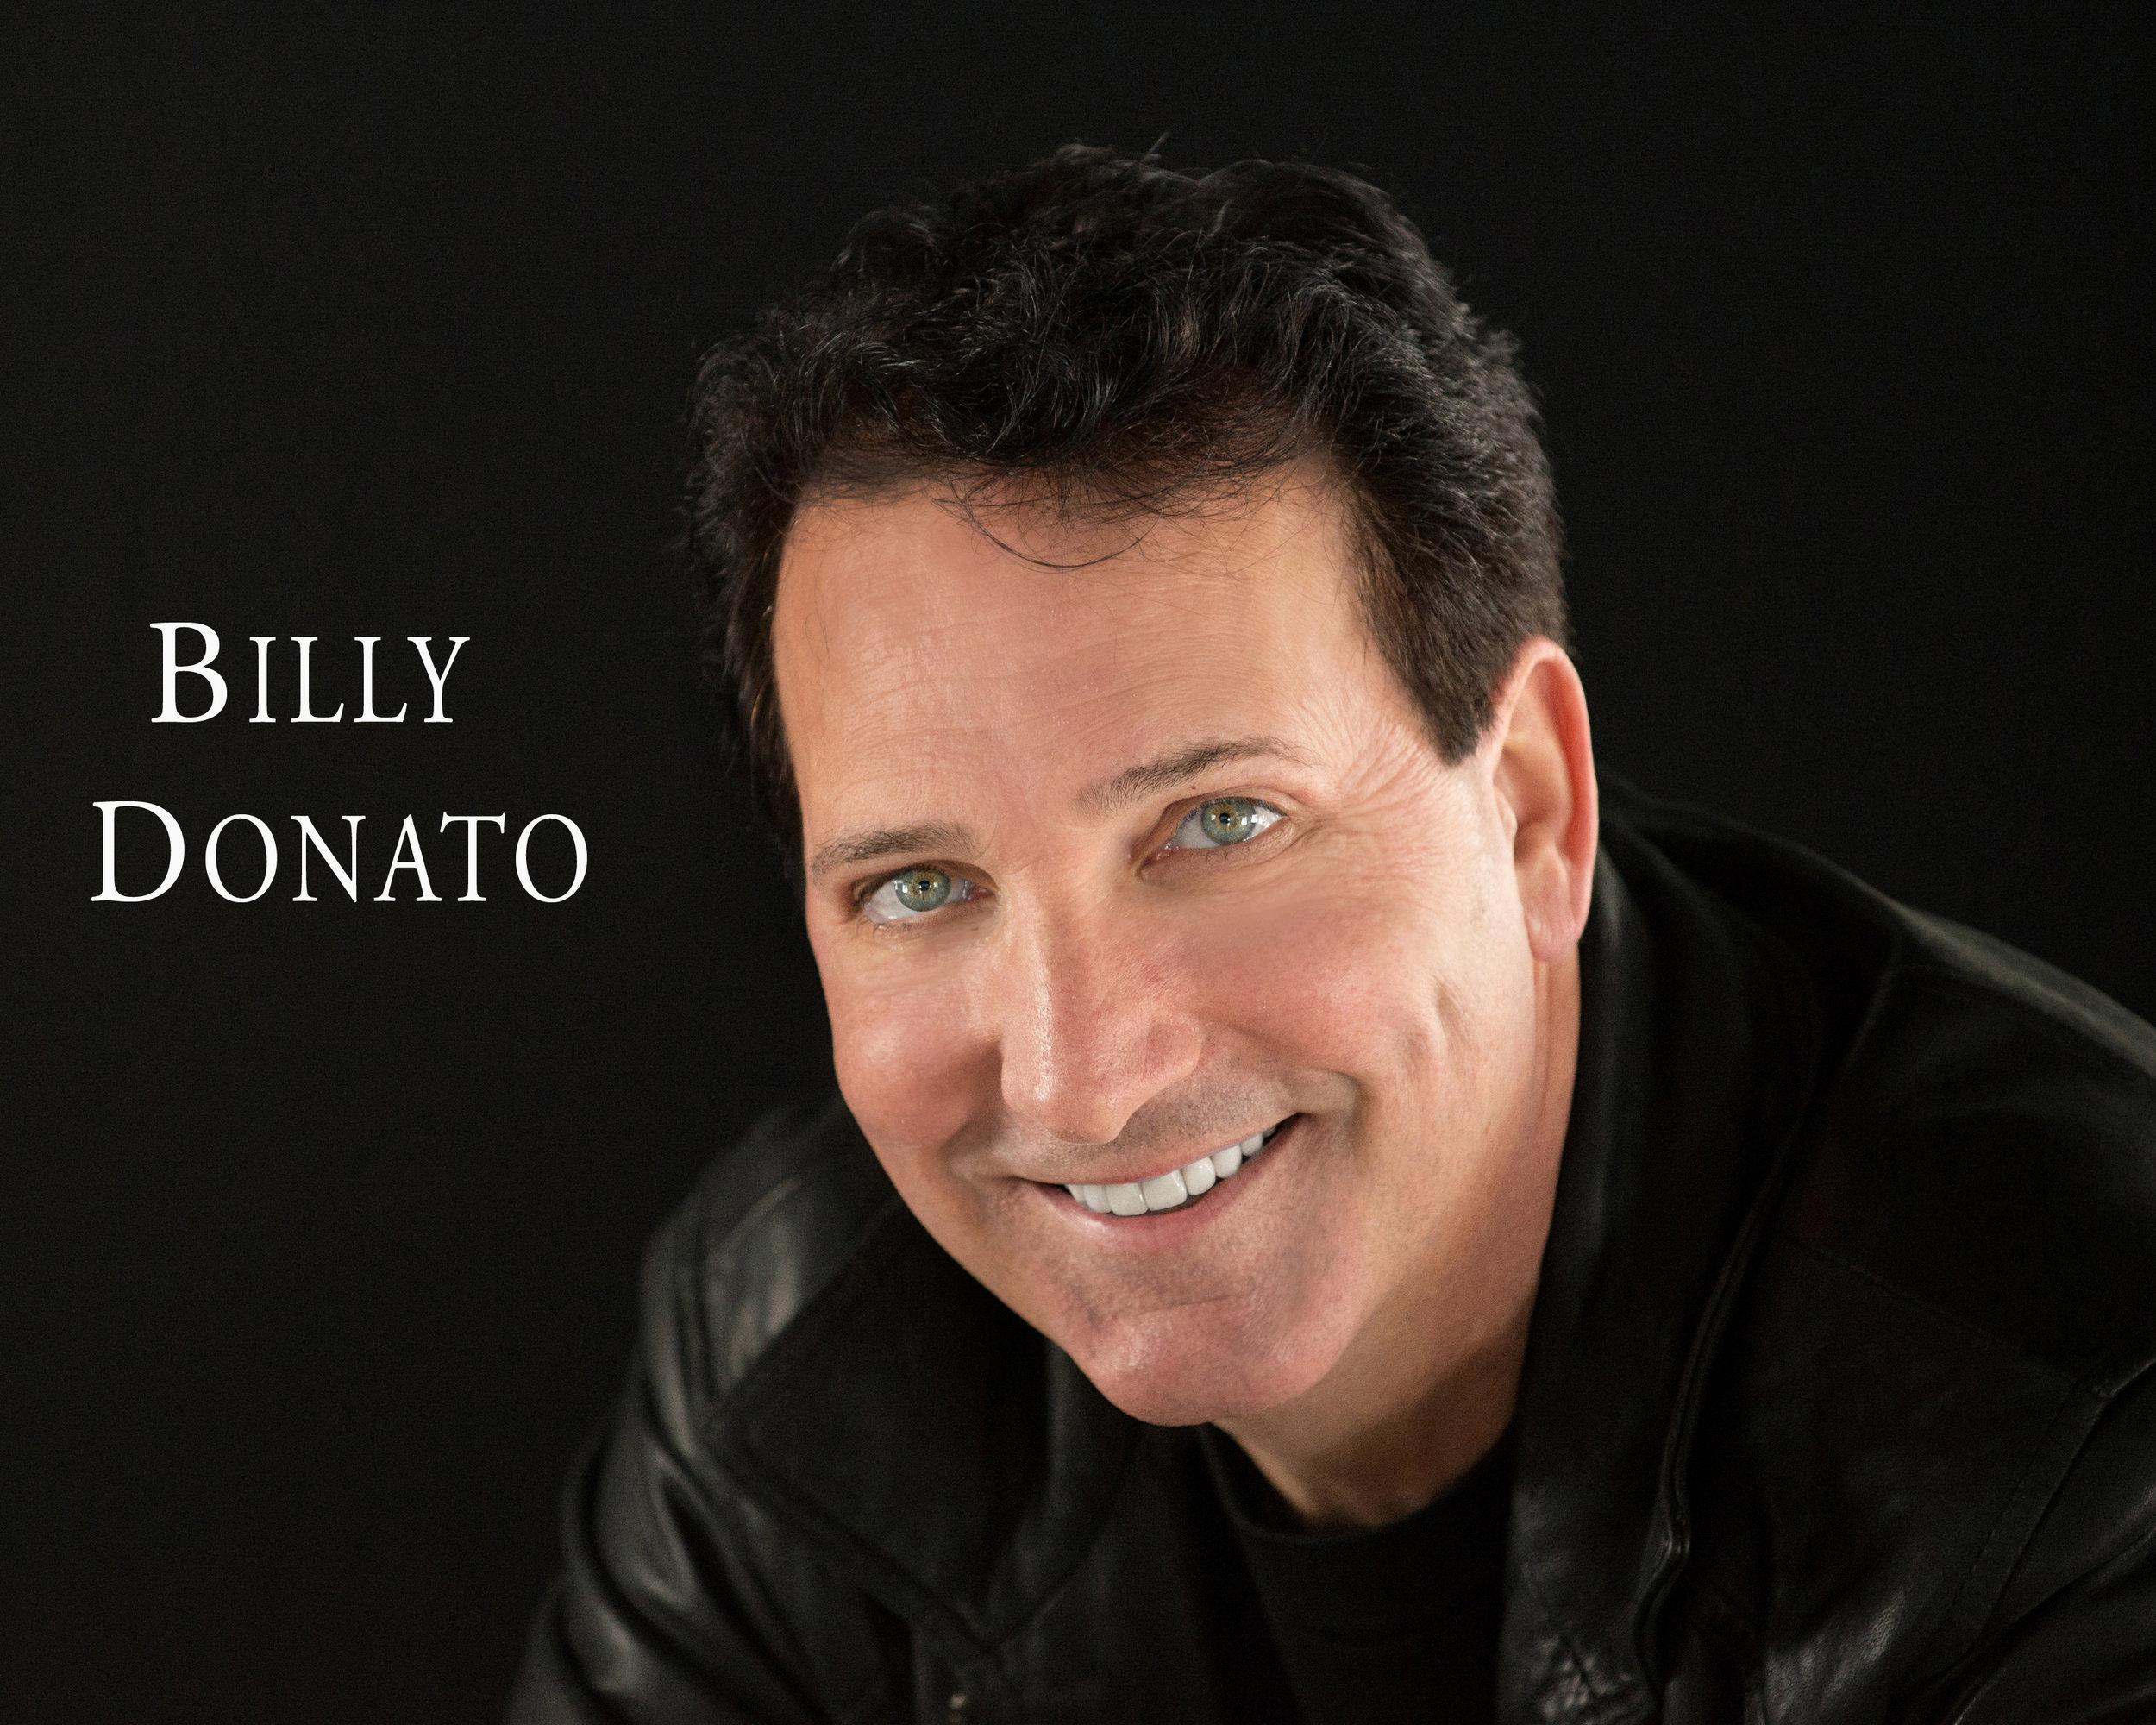 Billy Donato Headshot Promotional            Photo (2).jpg